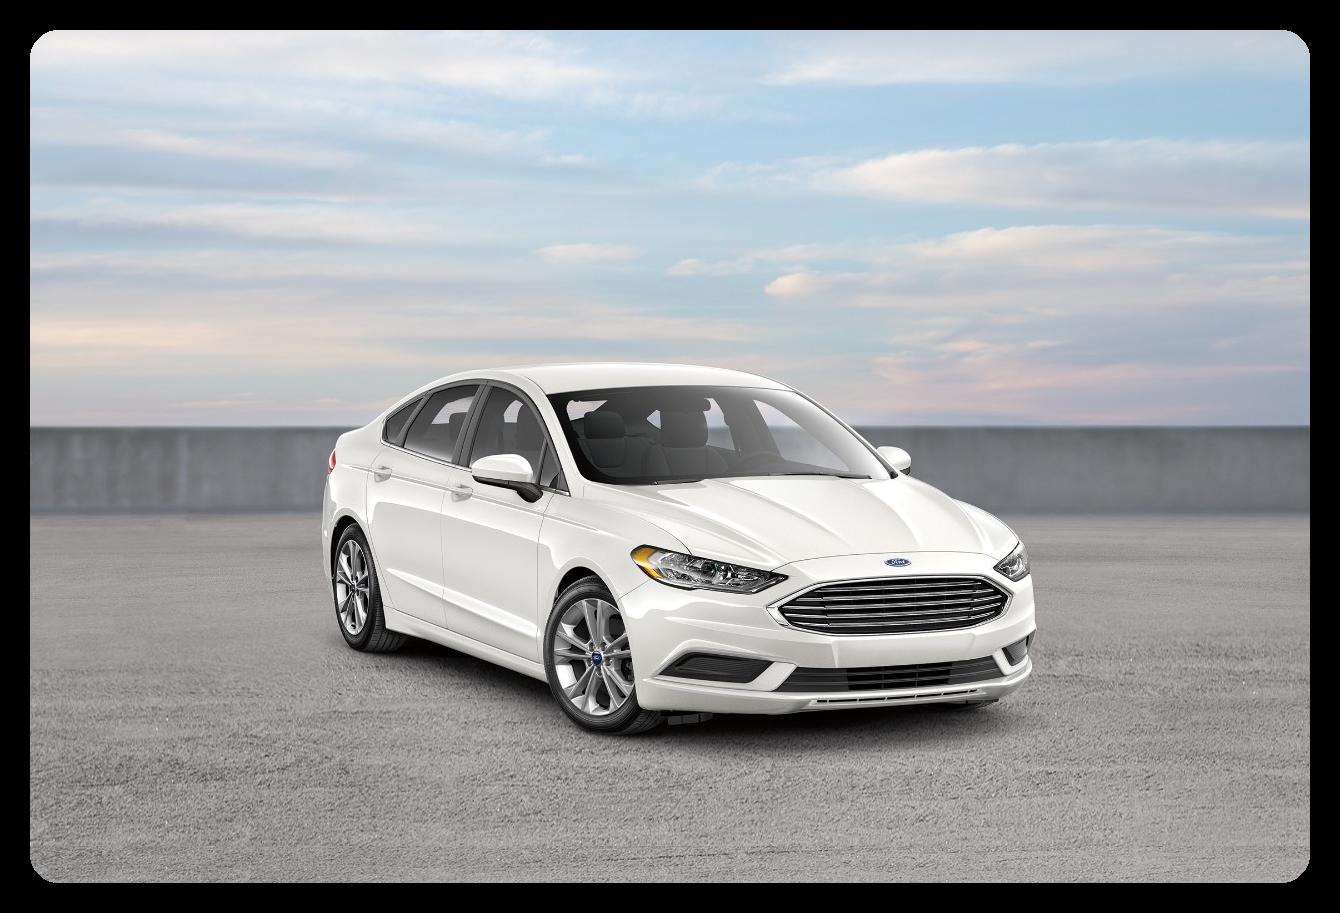 2018 ford fusion hybrid ford sedans steve marsh ford milan tn. Black Bedroom Furniture Sets. Home Design Ideas